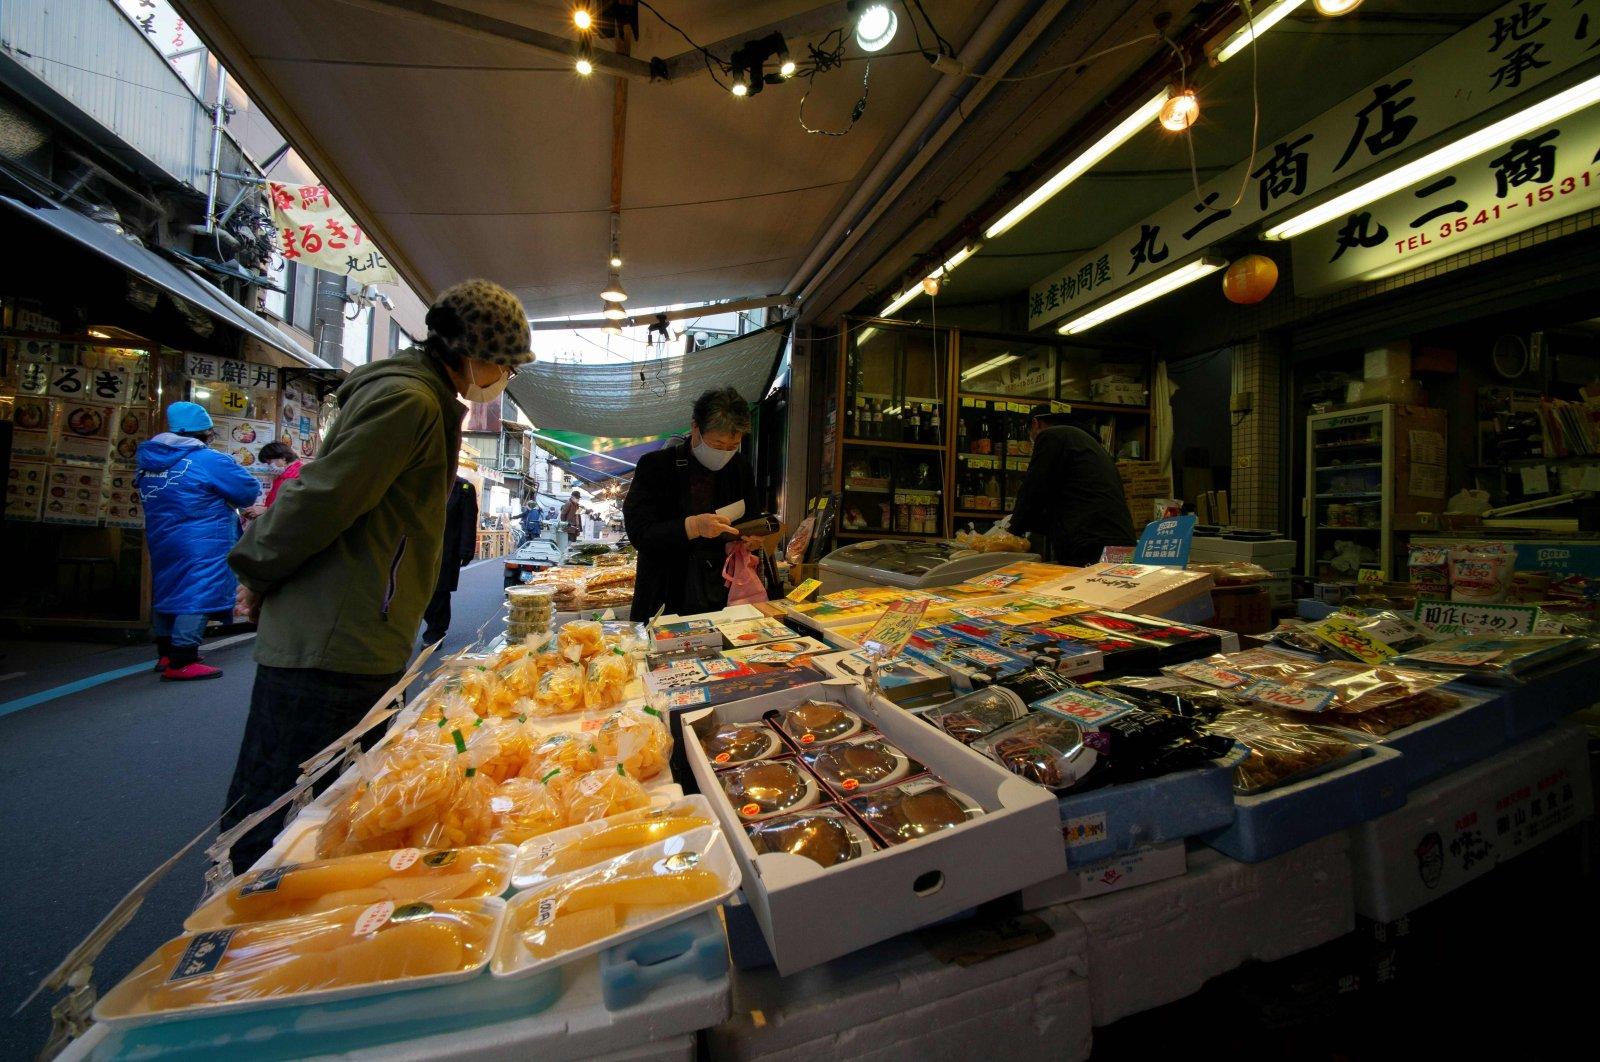 Customers visit Tsukiji district's outer market, or jogai, in Tokyo, Japan, Dec. 8, 2020. (AFP Photo)